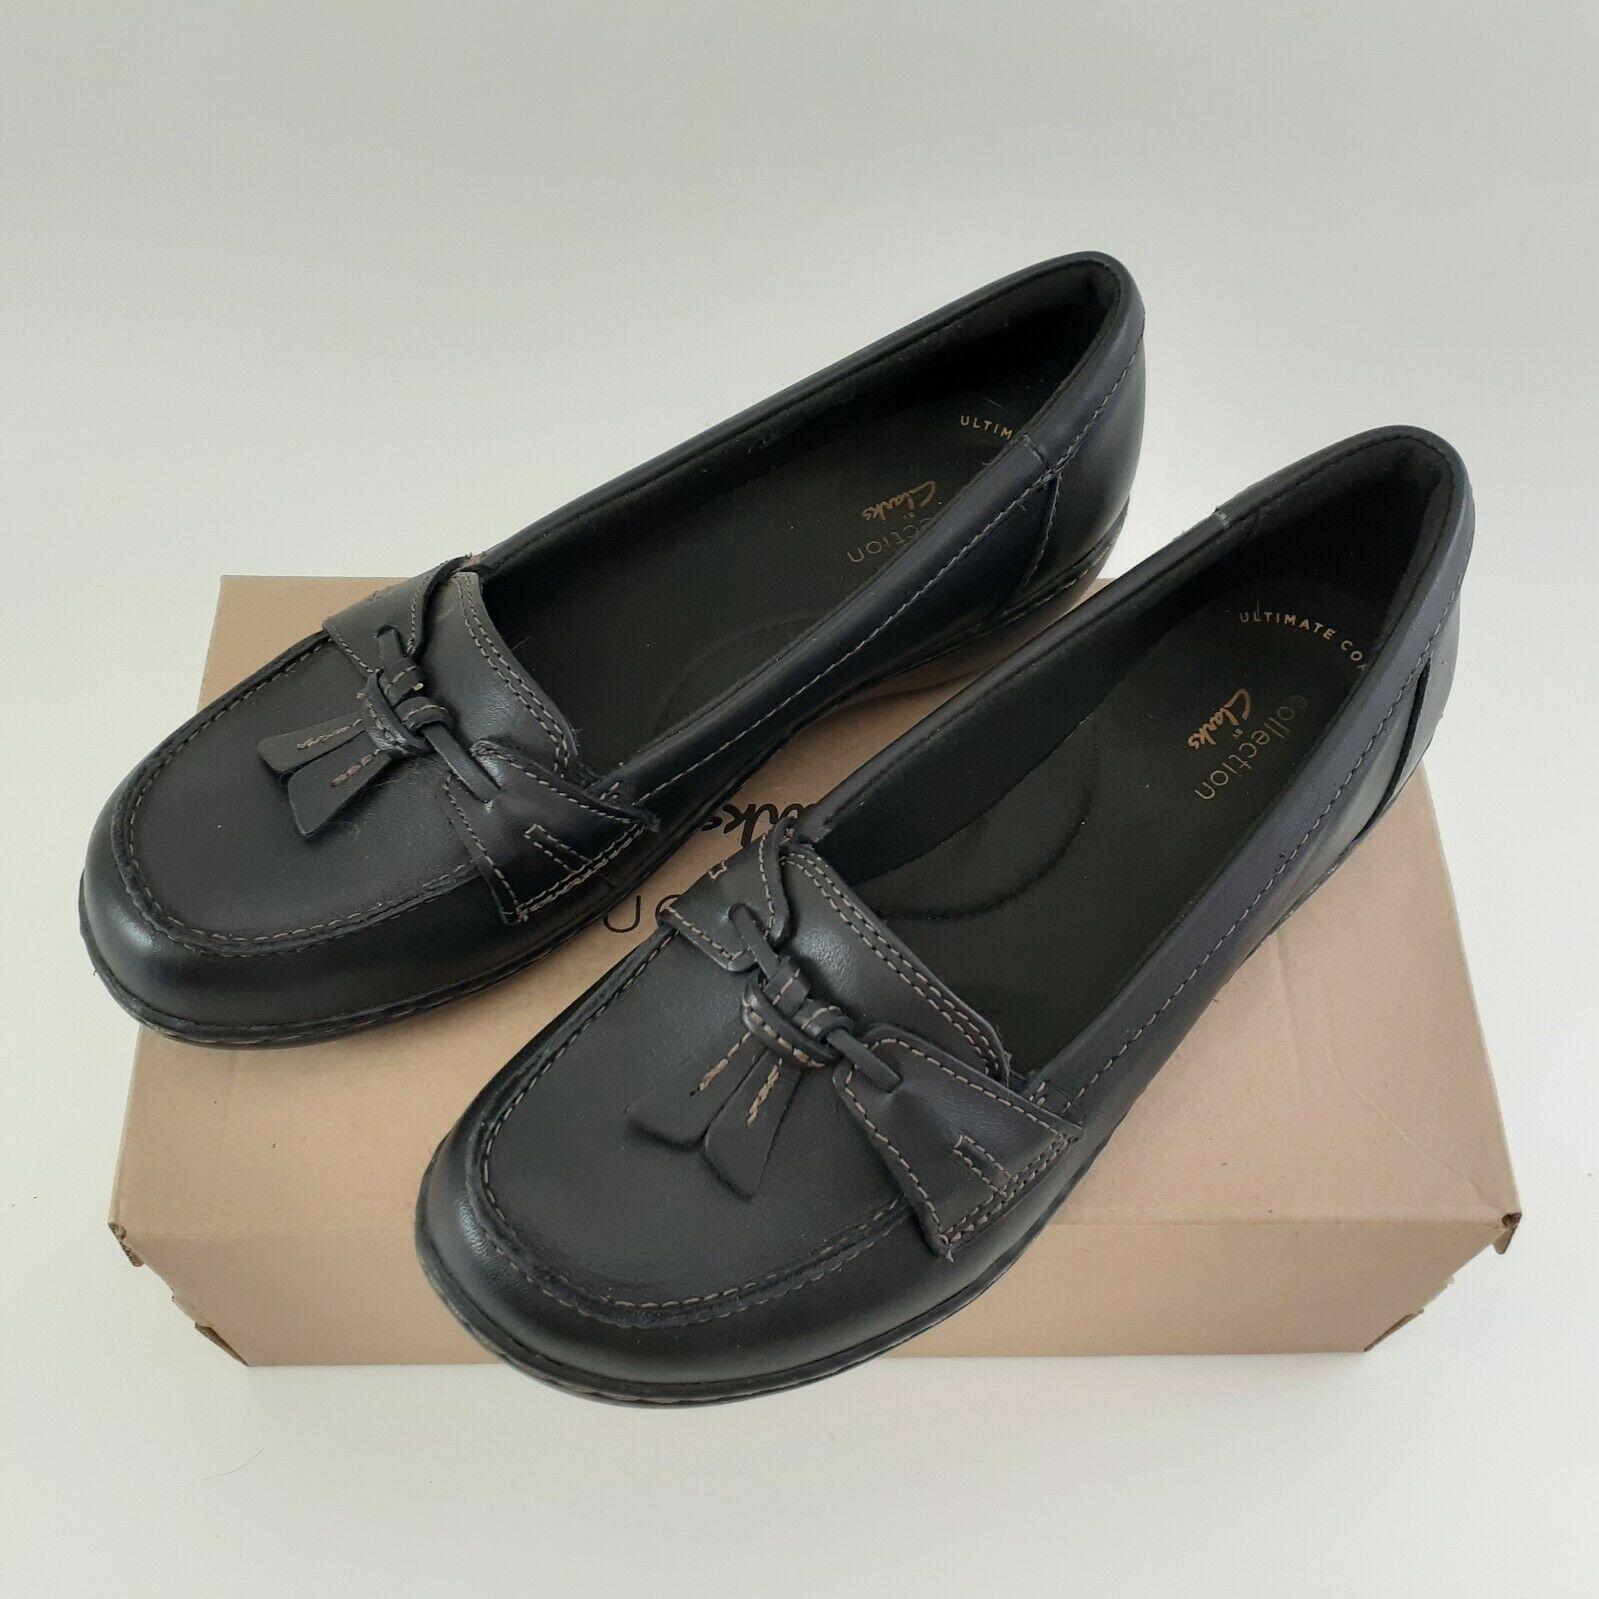 CLARKS Womens Ashland Bubble Slip-On Loafer- Black Sz 7M